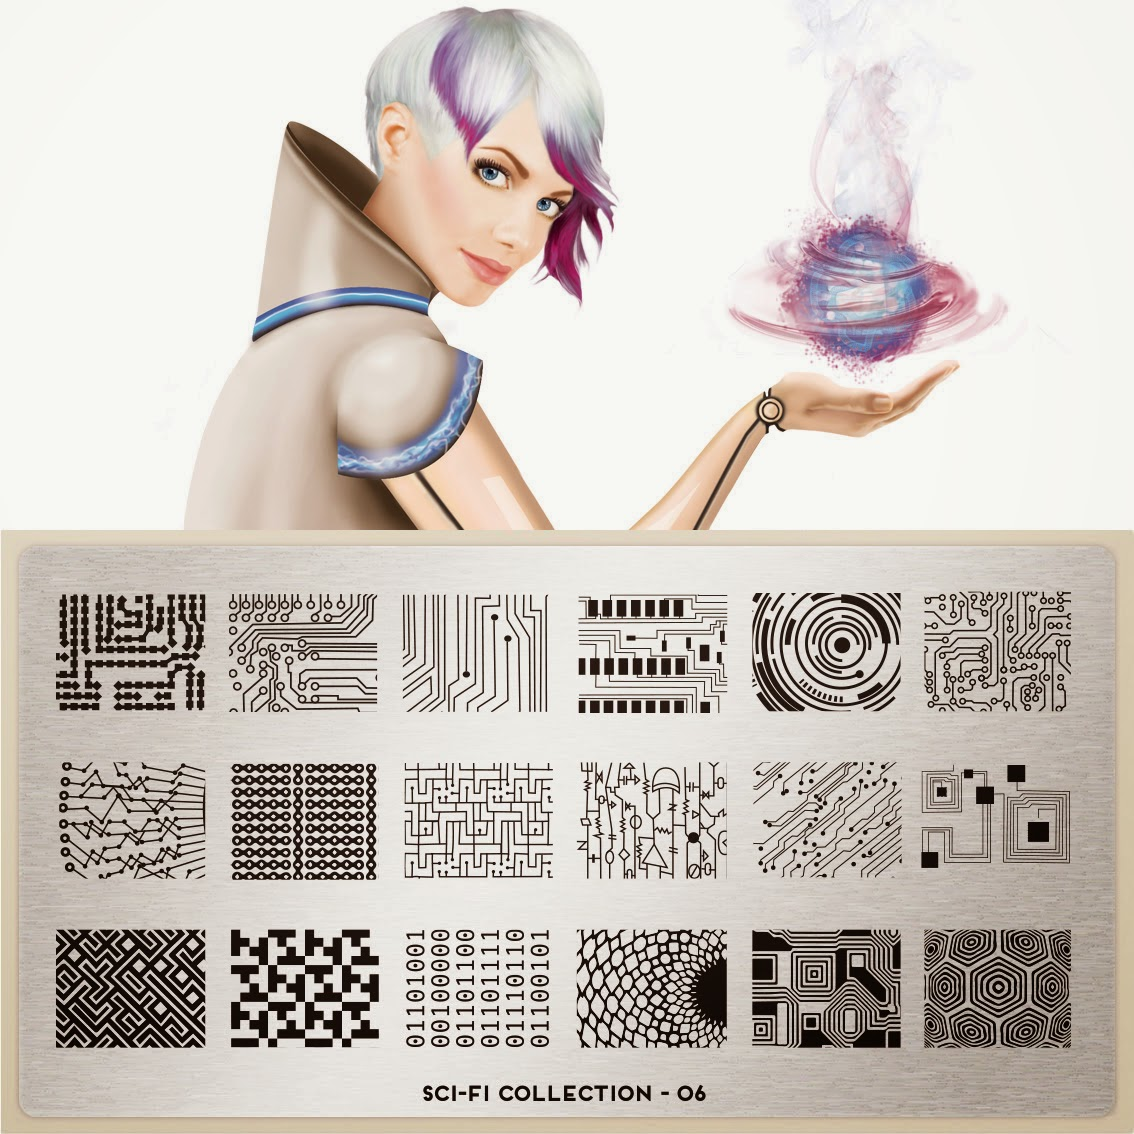 Lacquer Lockdown - MoYou London Sci-Fi Collection, MoYou London, stamping, nail art, new image plates 2014, new stamping plates 2014, new nail art plates 2014, alien nail art, aliens, tentacles, space nials, the matrix nails, diy nail art, cute nail art ideas, esay nail art. pueen 2013, bundle monster,